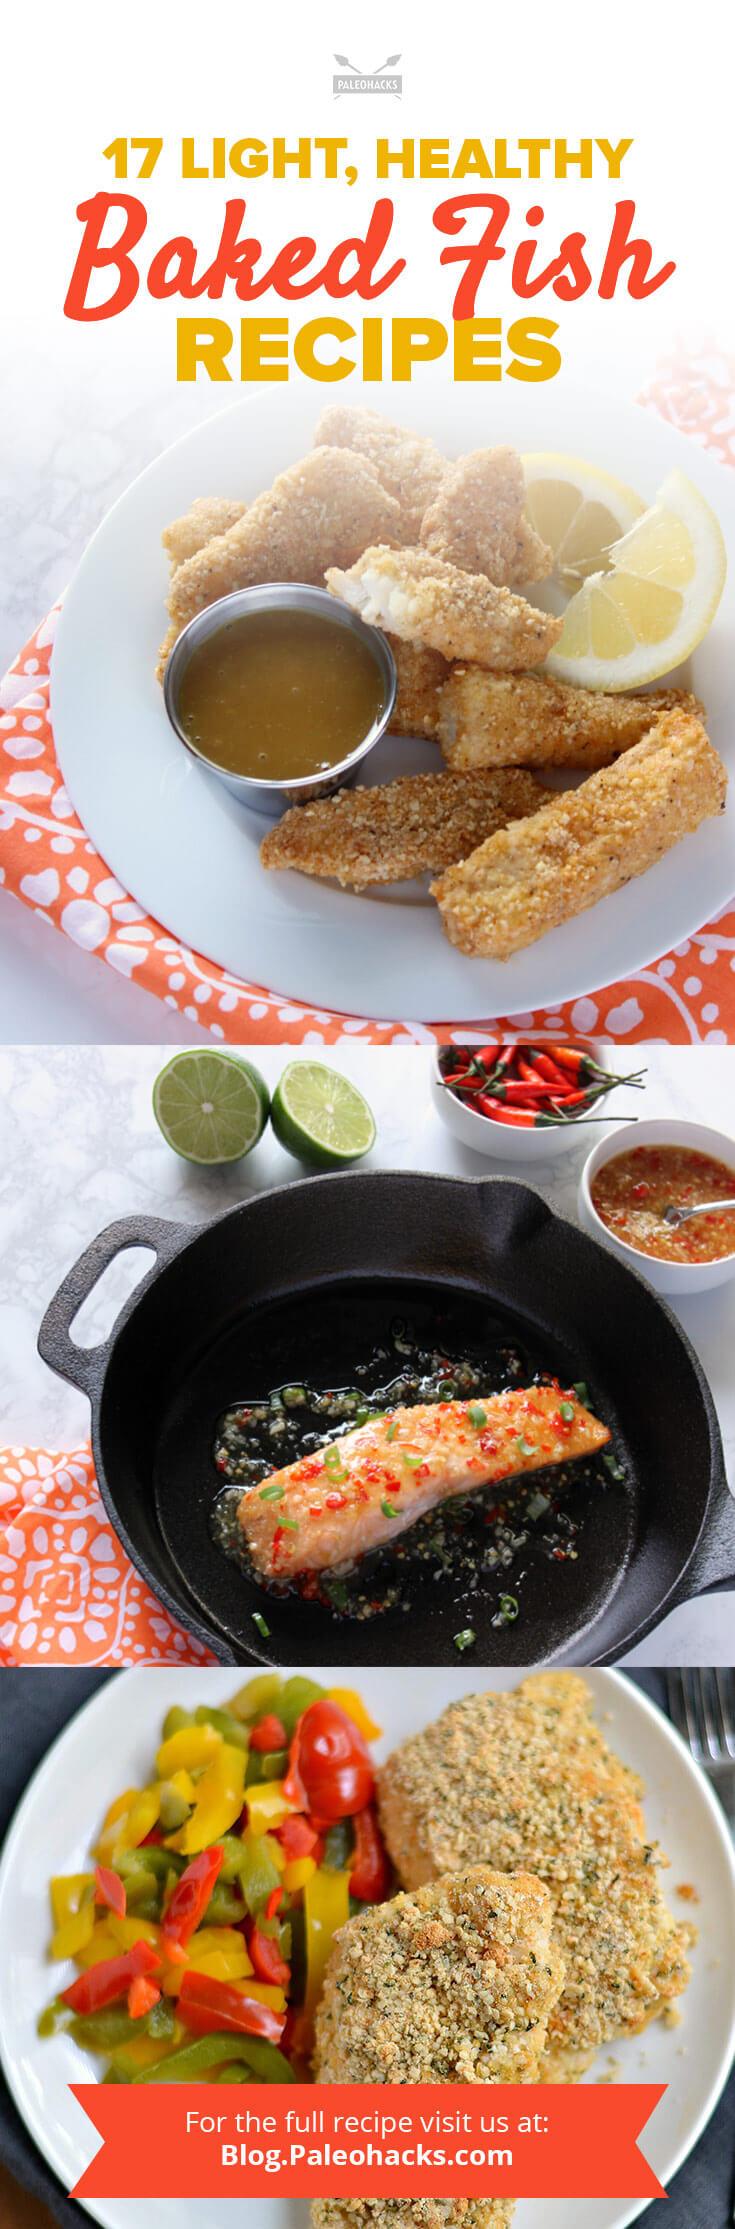 COMPILATION-PIN-17-Light-Healthy-Baked-Fish-Recipes.jpg